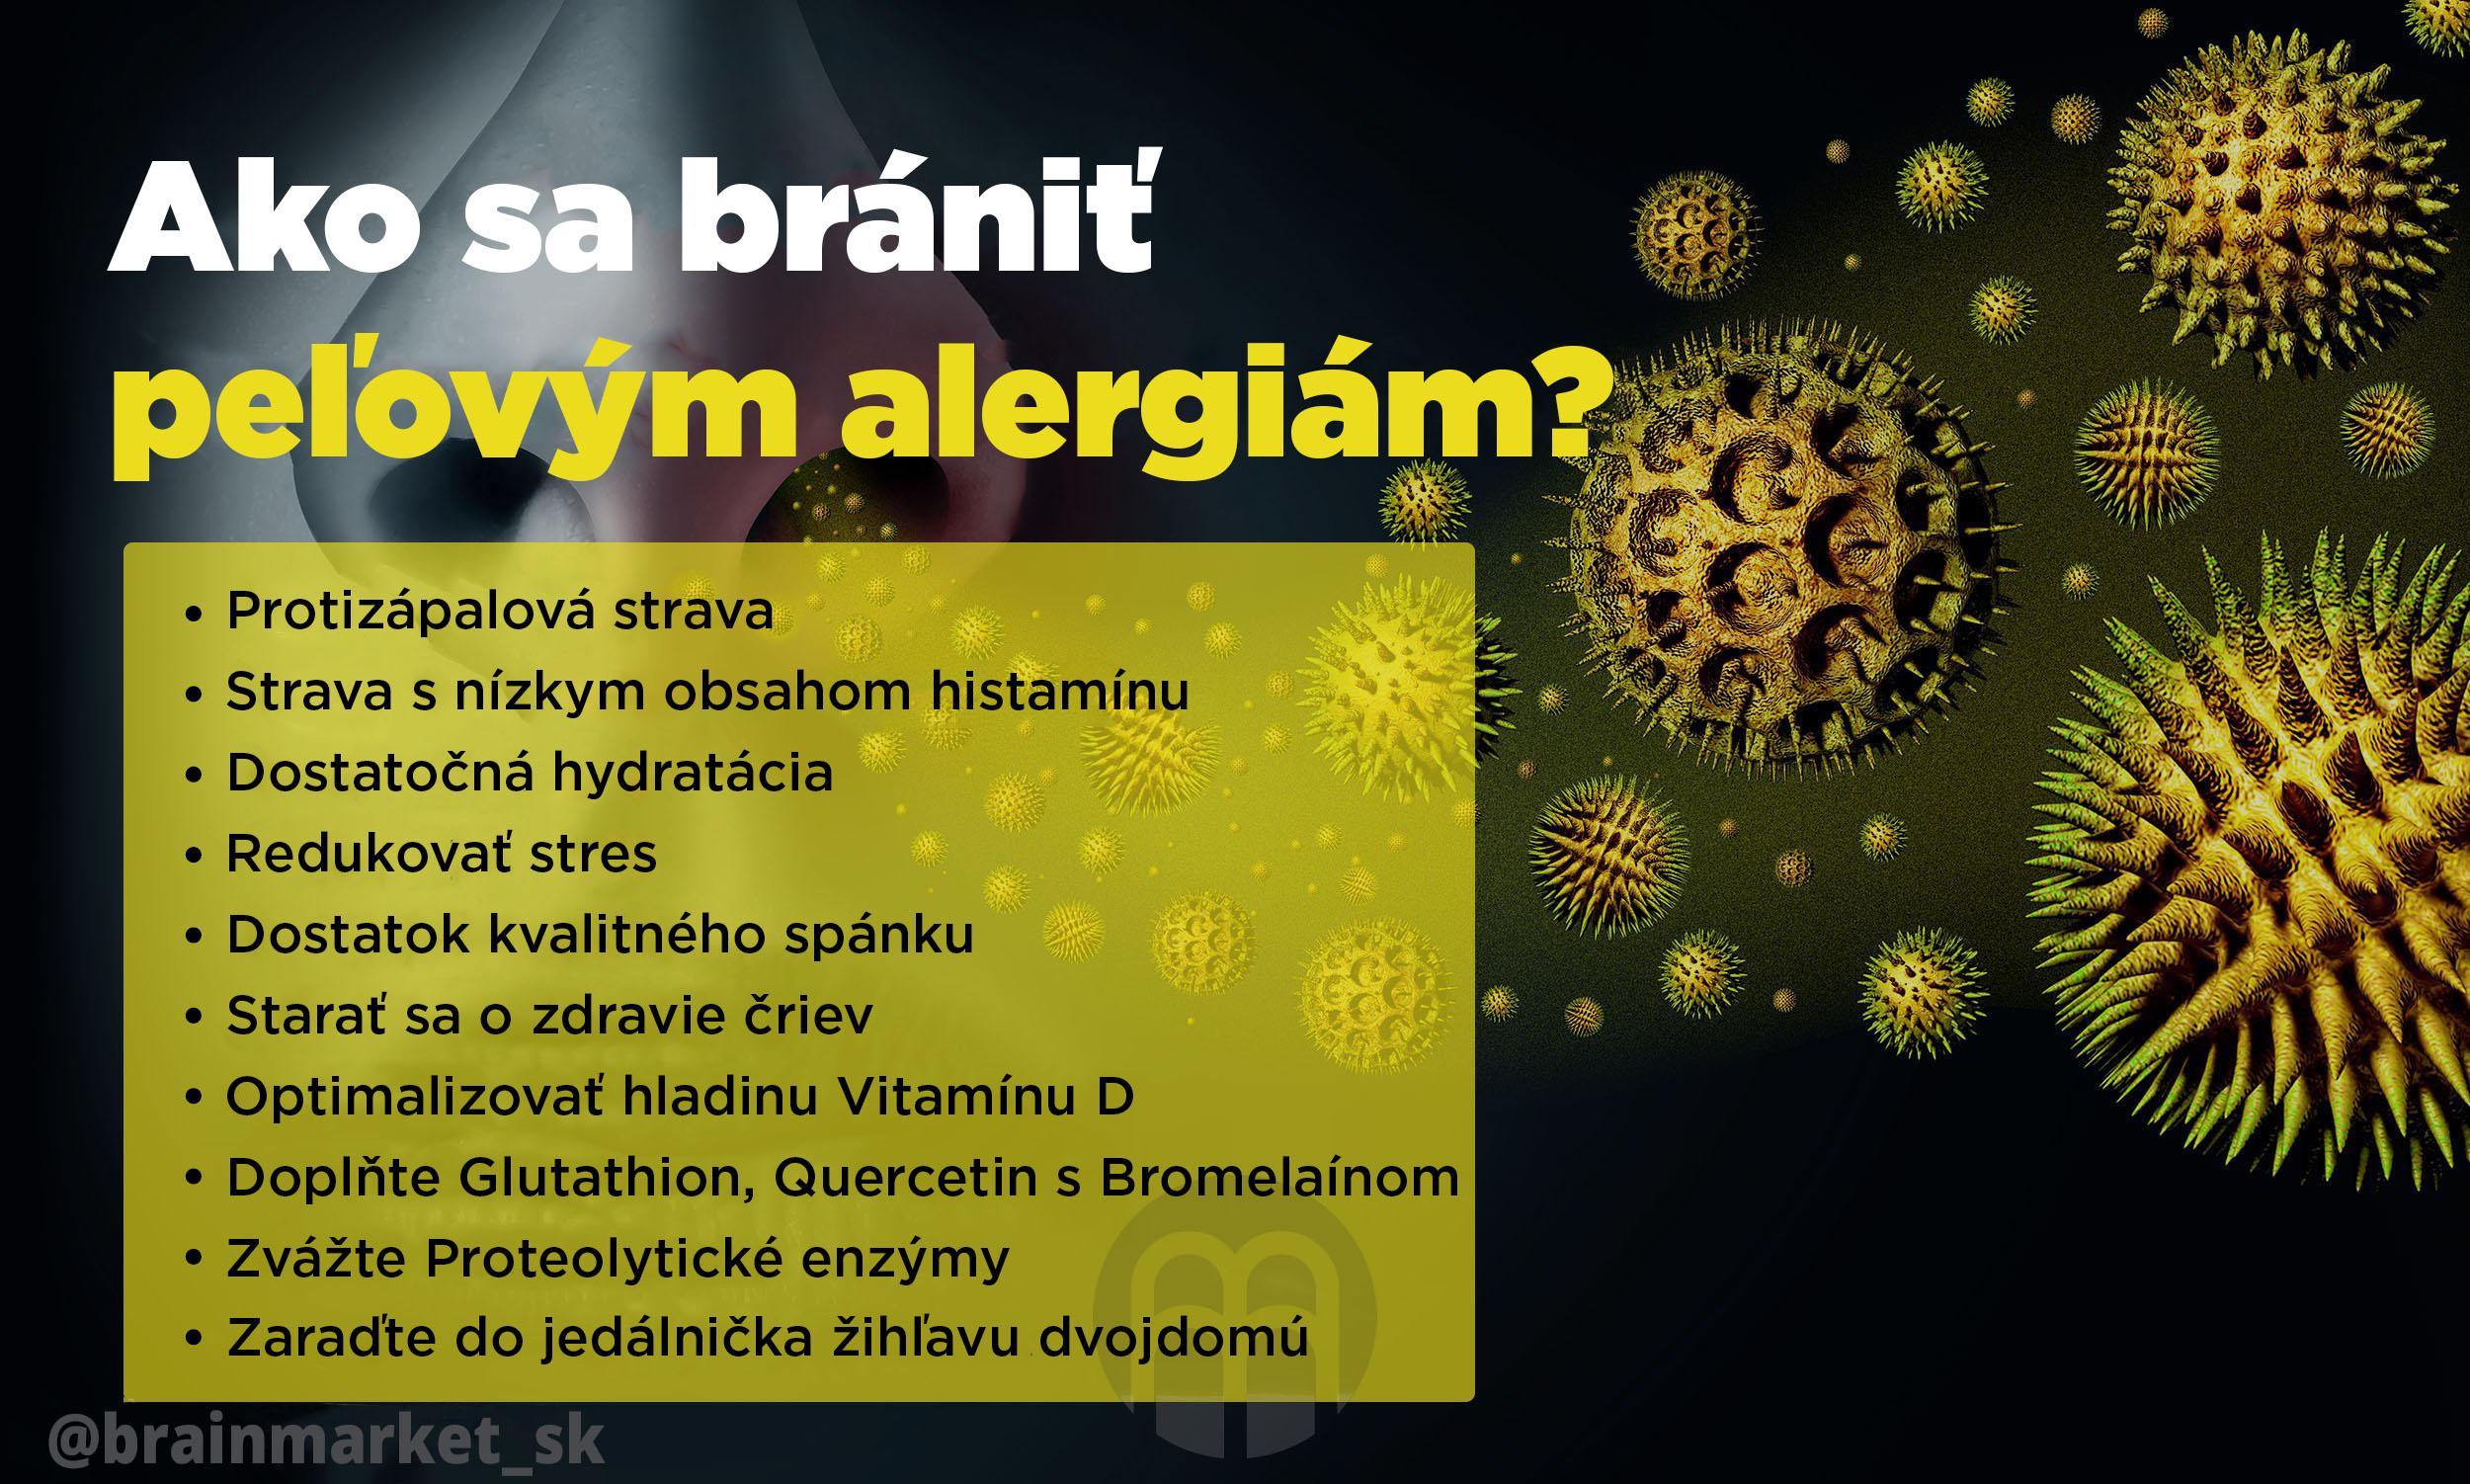 jak-lecit-alergii-na-pyl-infografika-brainmarket-sk